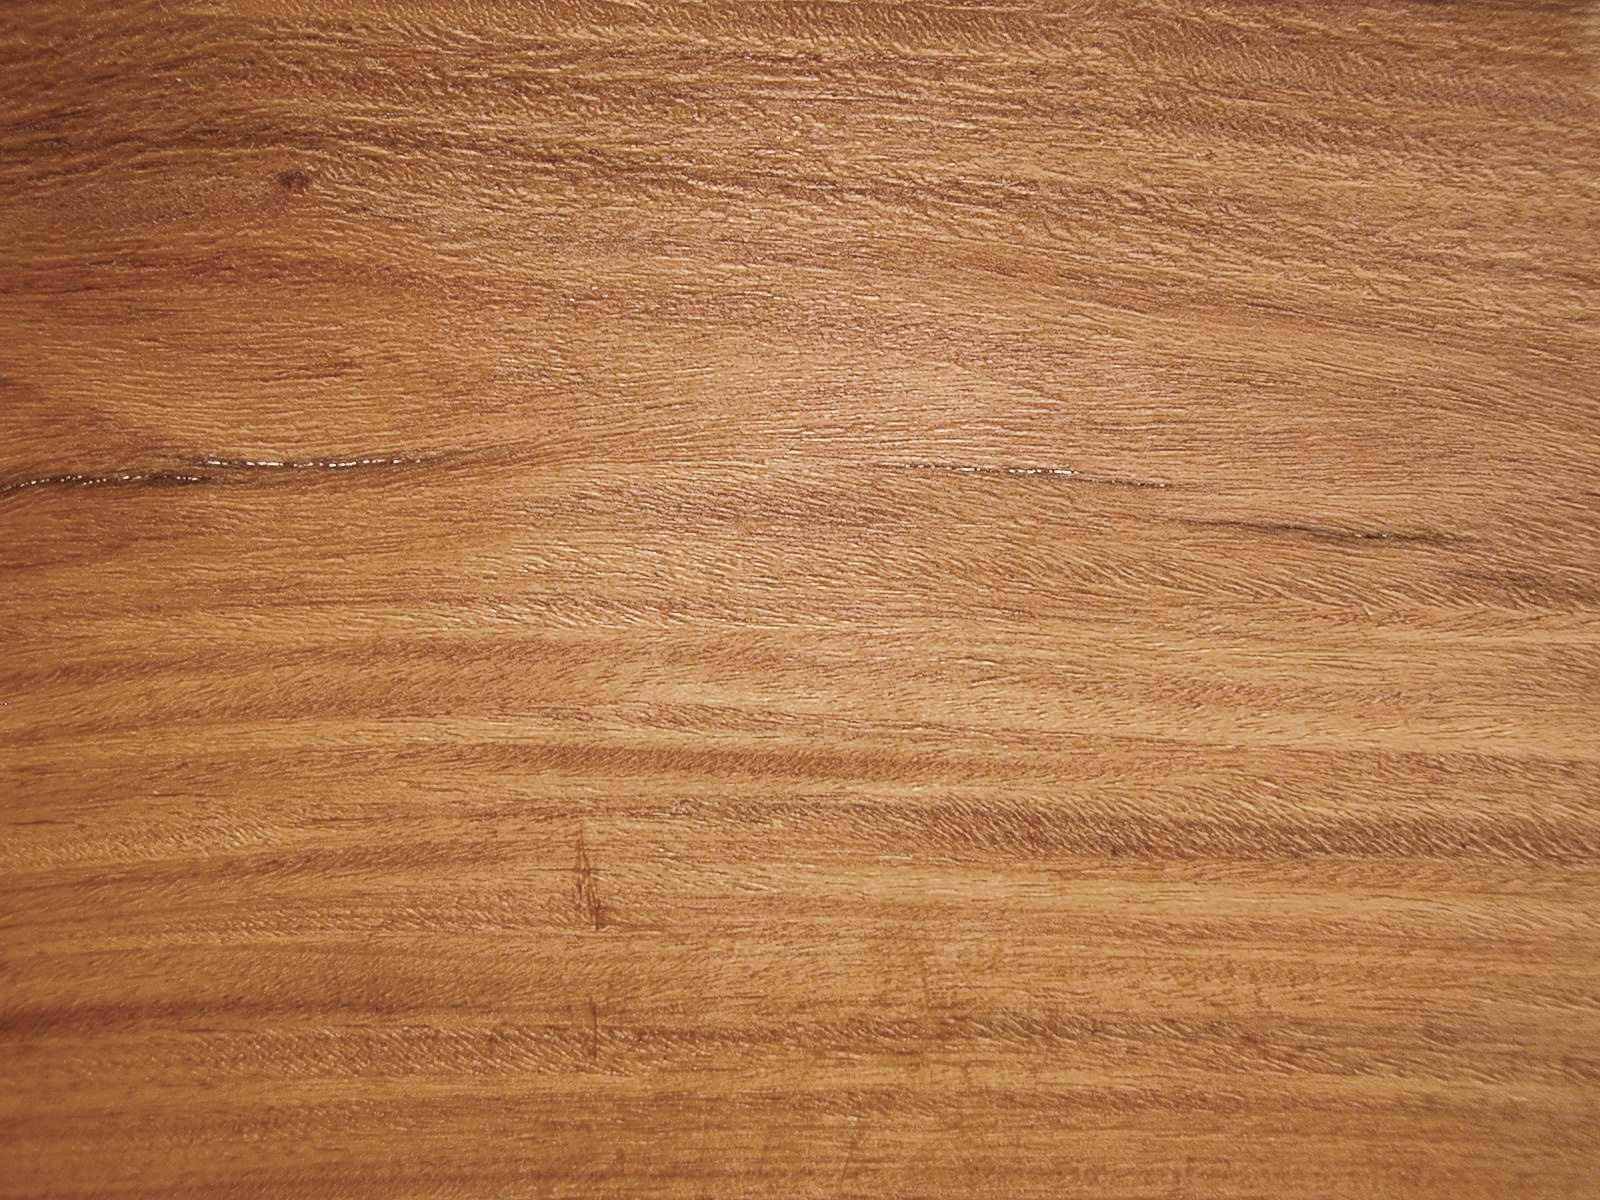 Holz for Holz wallpaper